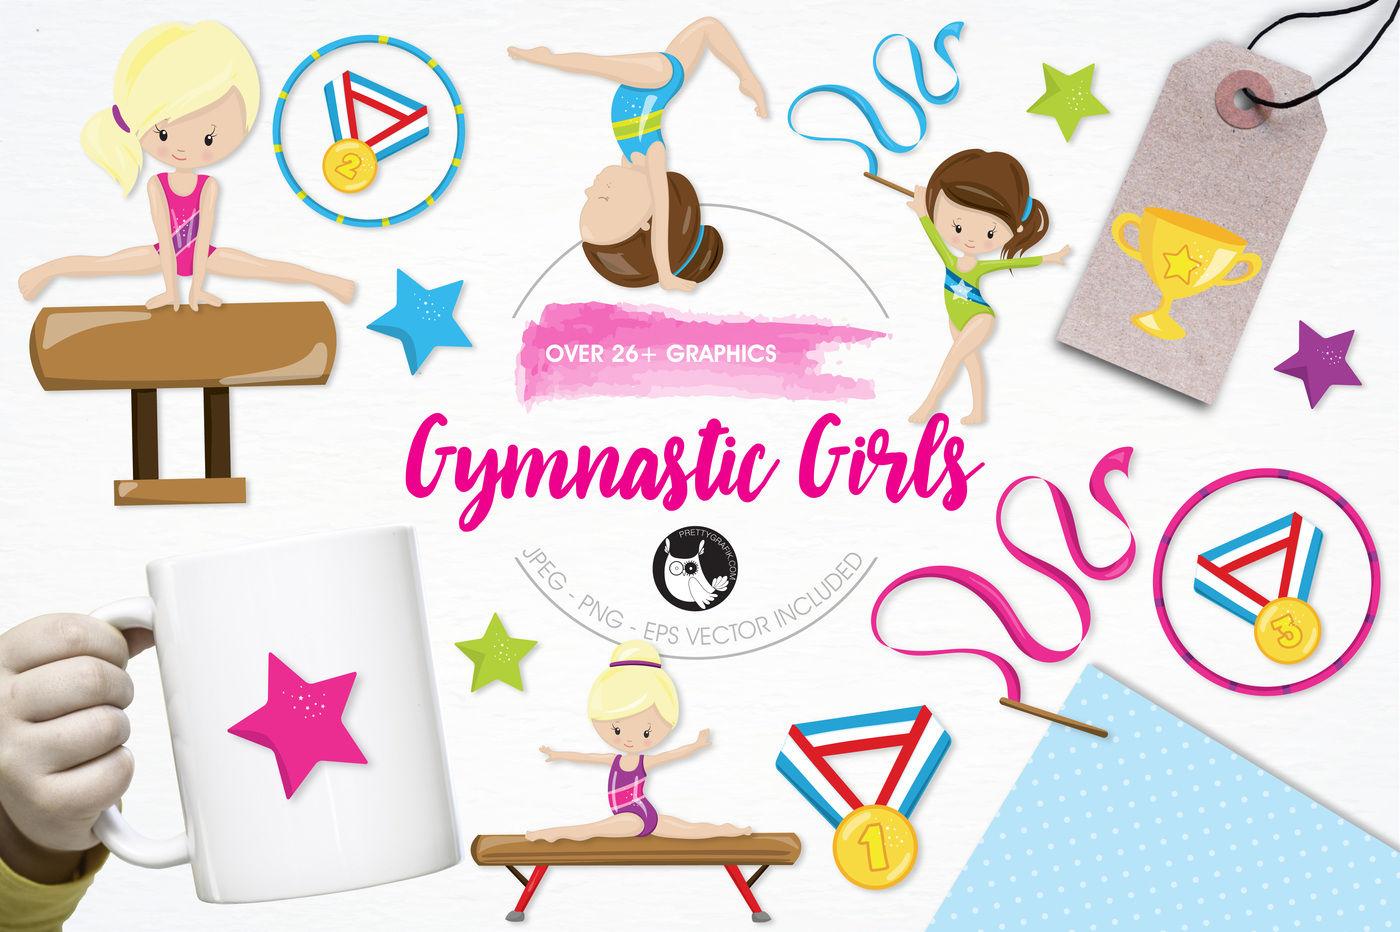 Gymnastic Girls Graphics And Illustrations By Prettygrafik Design